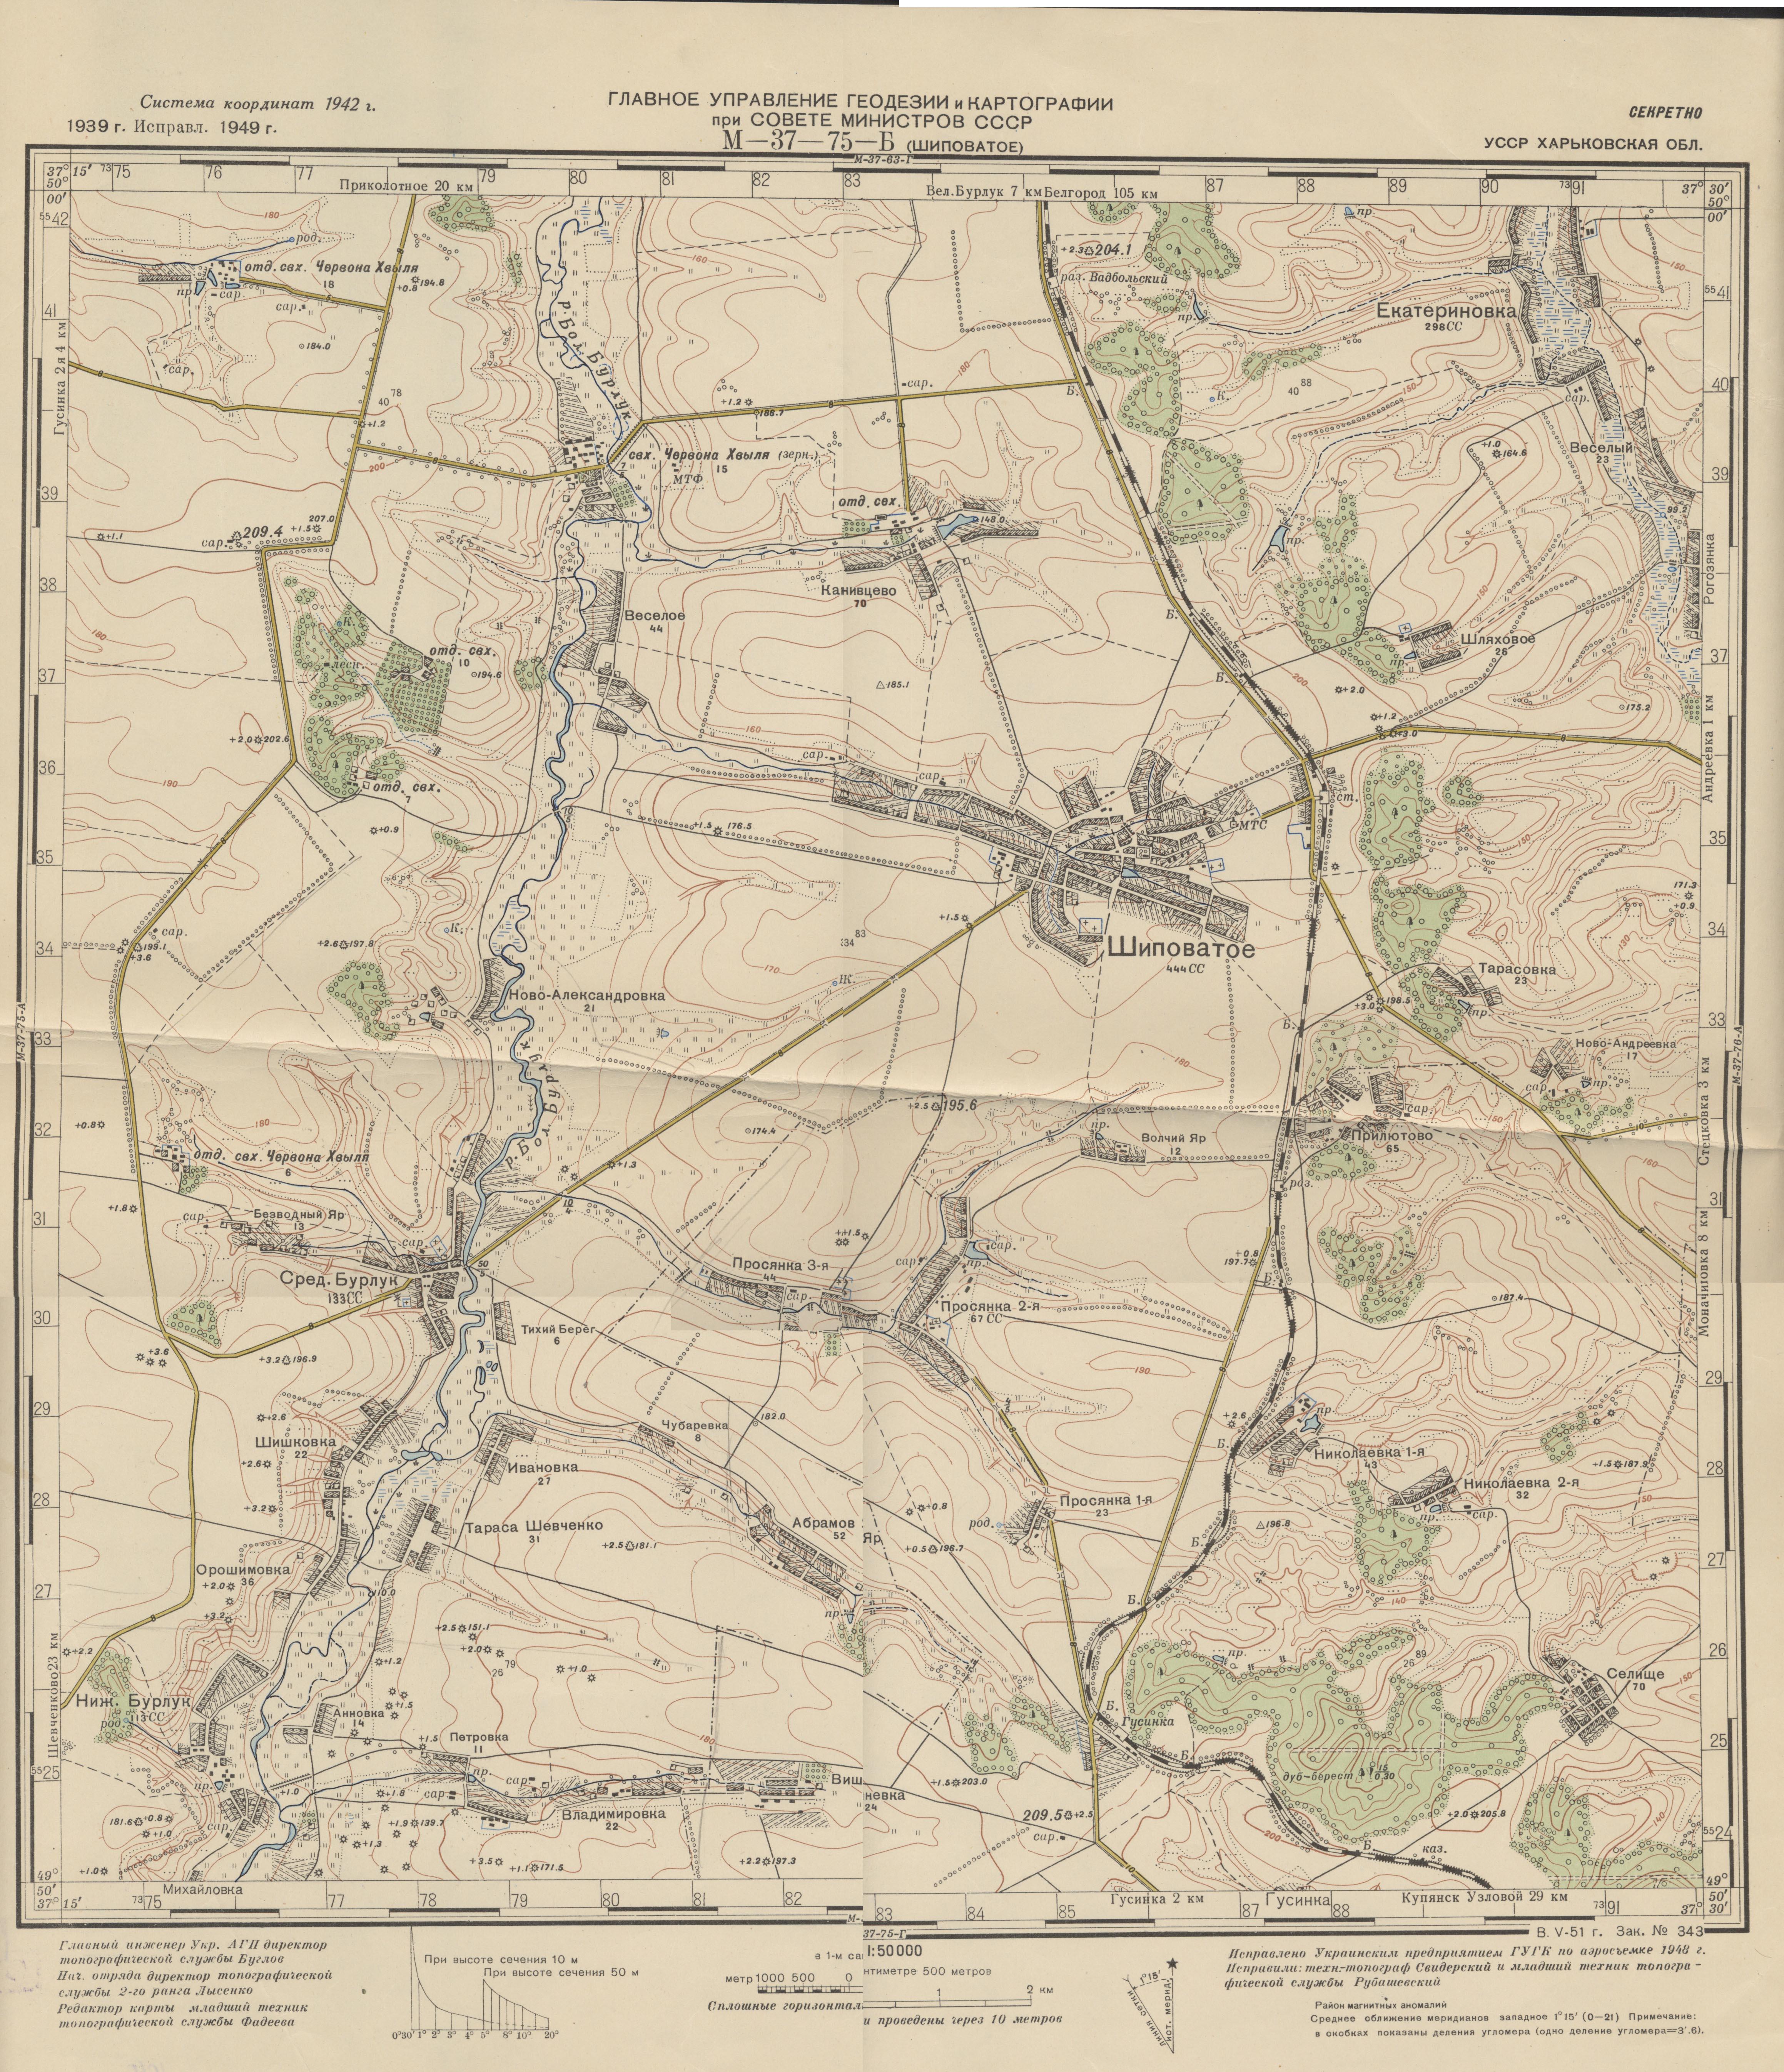 http://freemap.com.ua/maps/rkka-500m/M-37-75-B.jpg